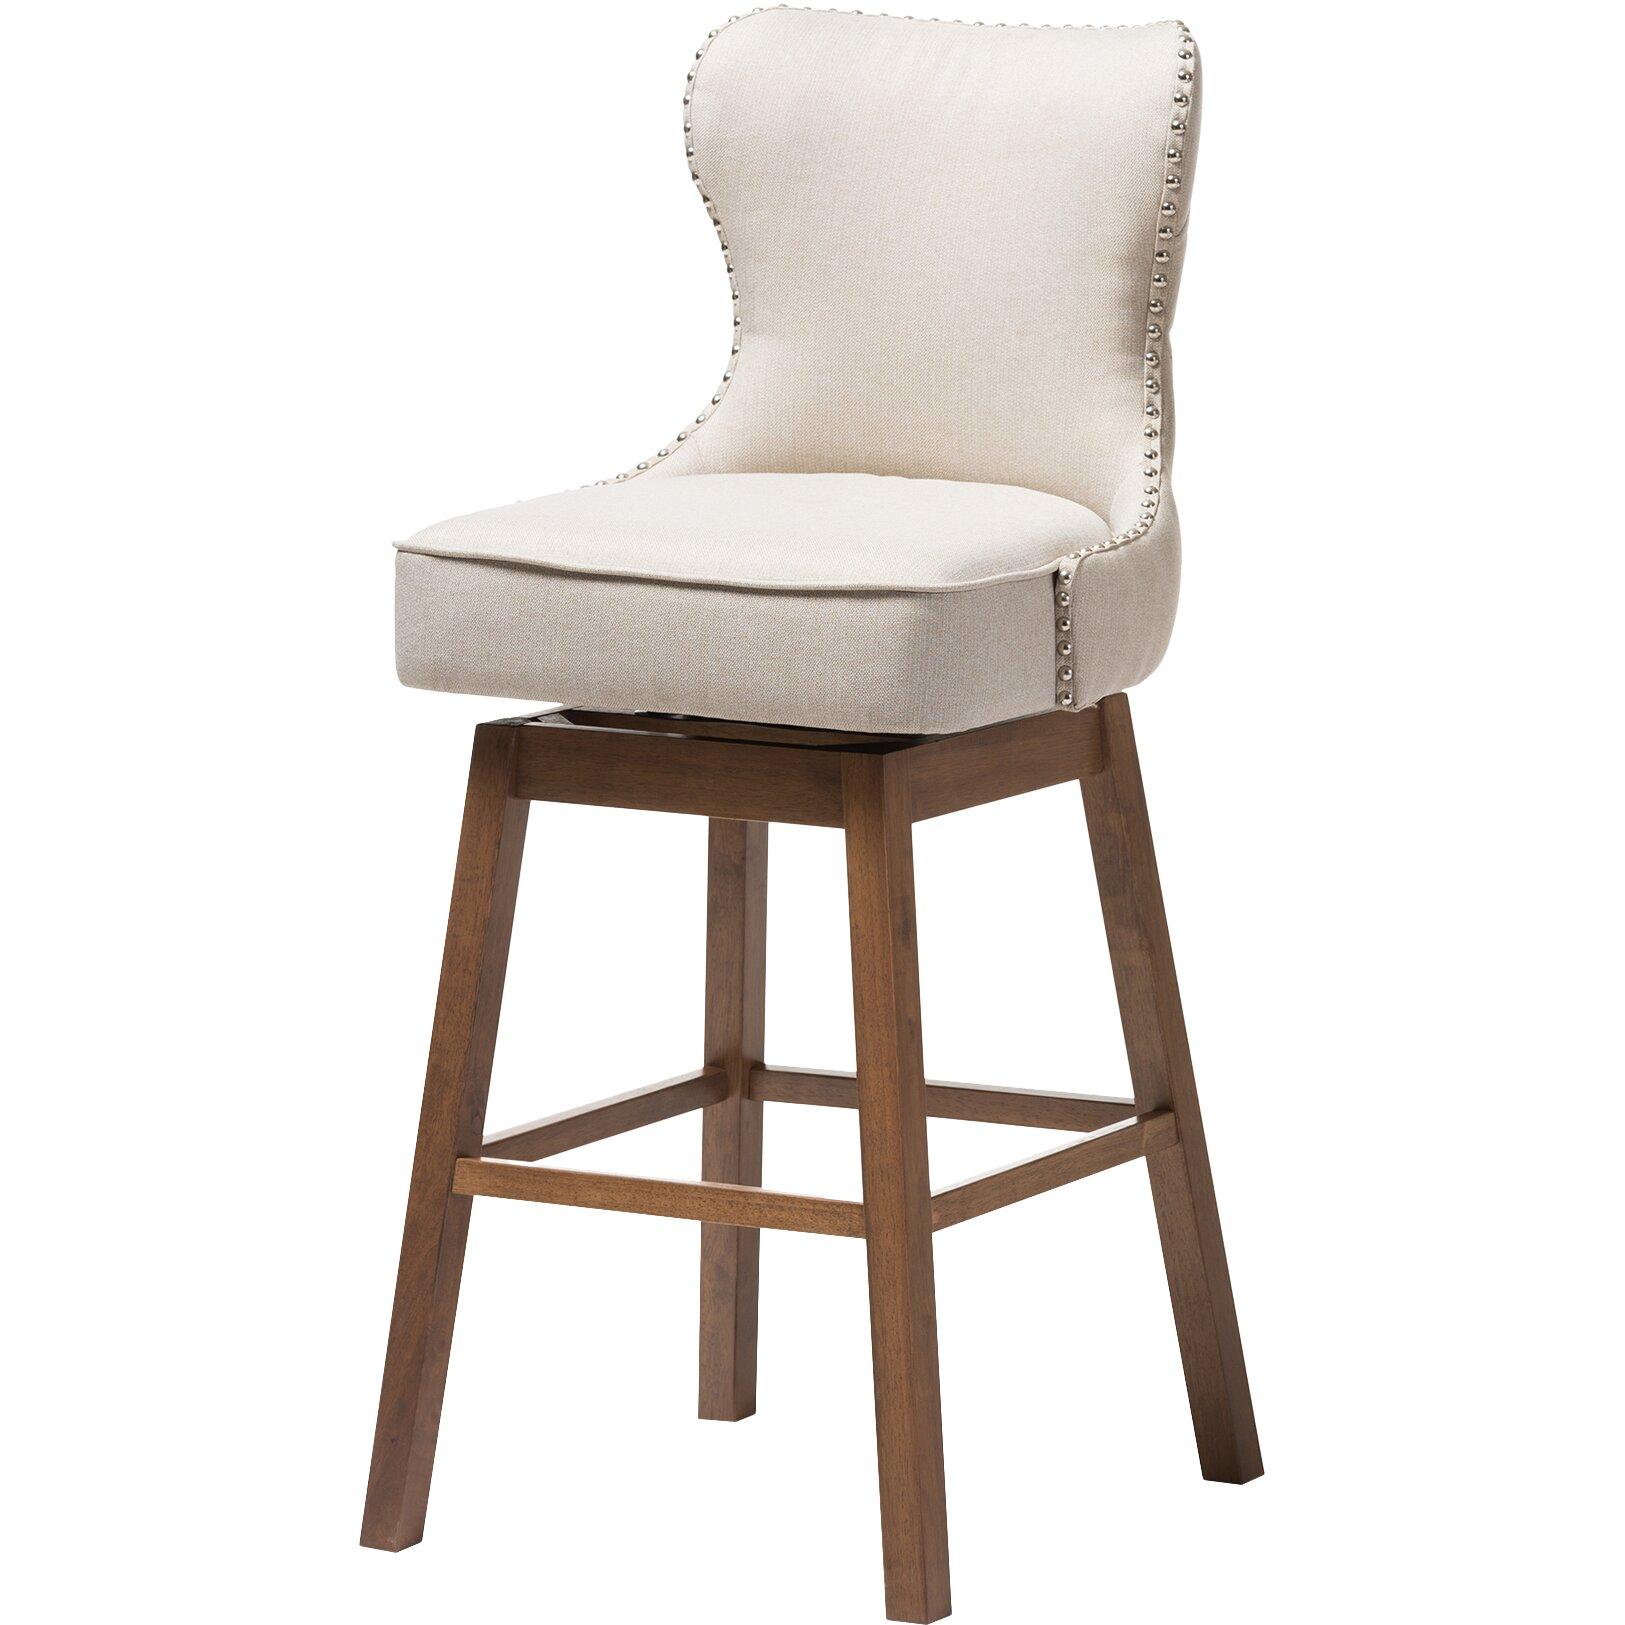 Wholesale interiors baxton studio swivel bar stool for Baxton studio